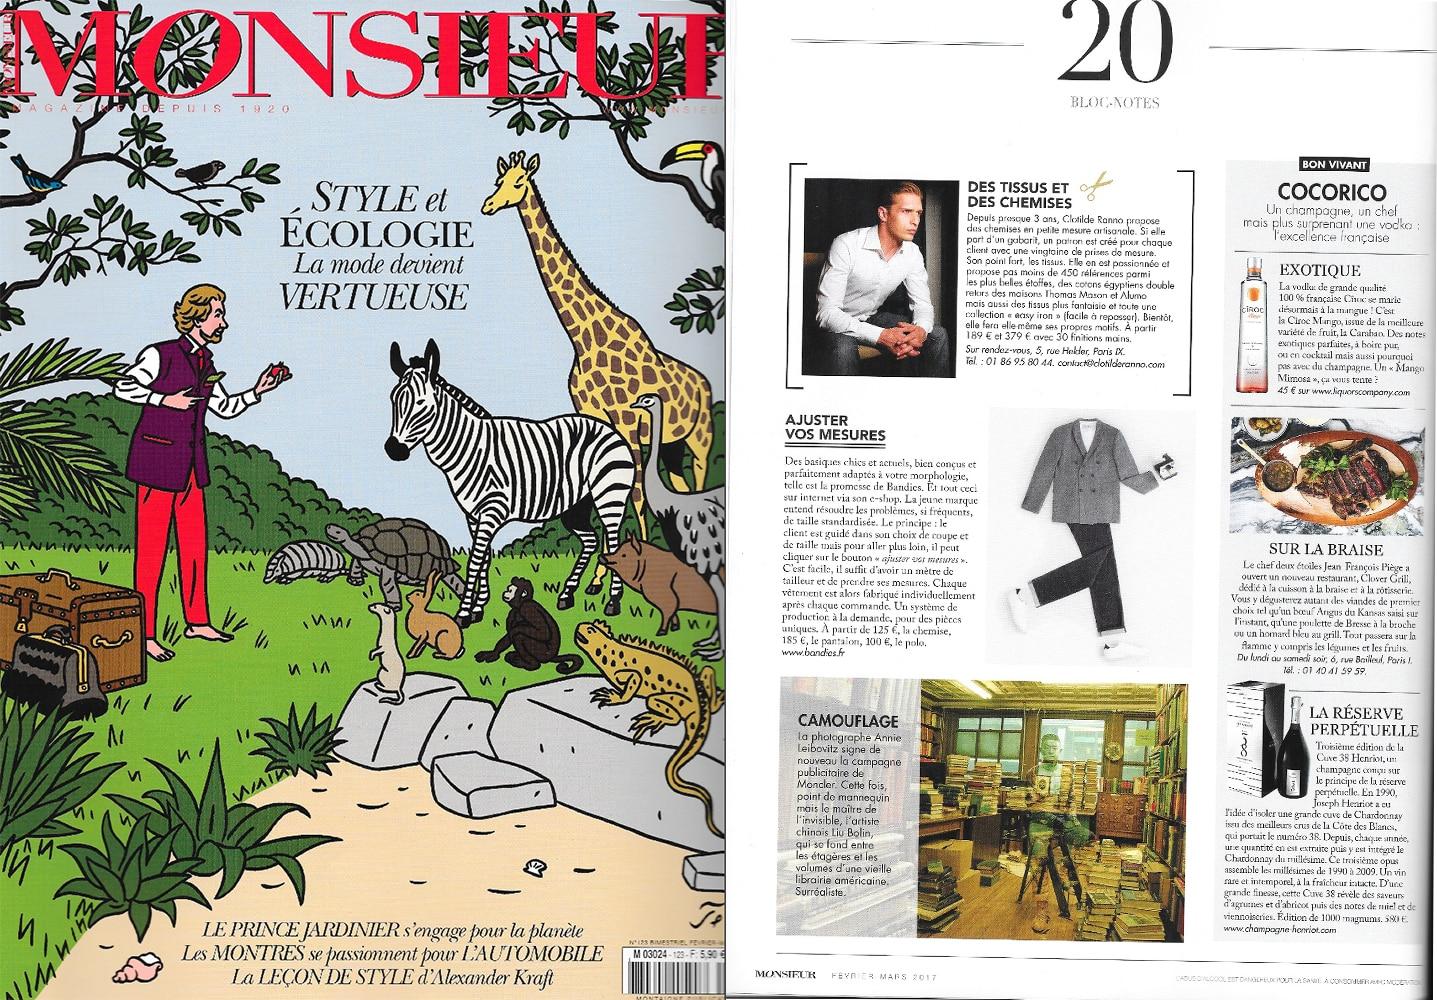 Monsieur Magazine, Clotilde Ranno, chemise sur mesure, chemise sur mesure paris, chemise luxe, mode homme, mode masculine, chemise homme